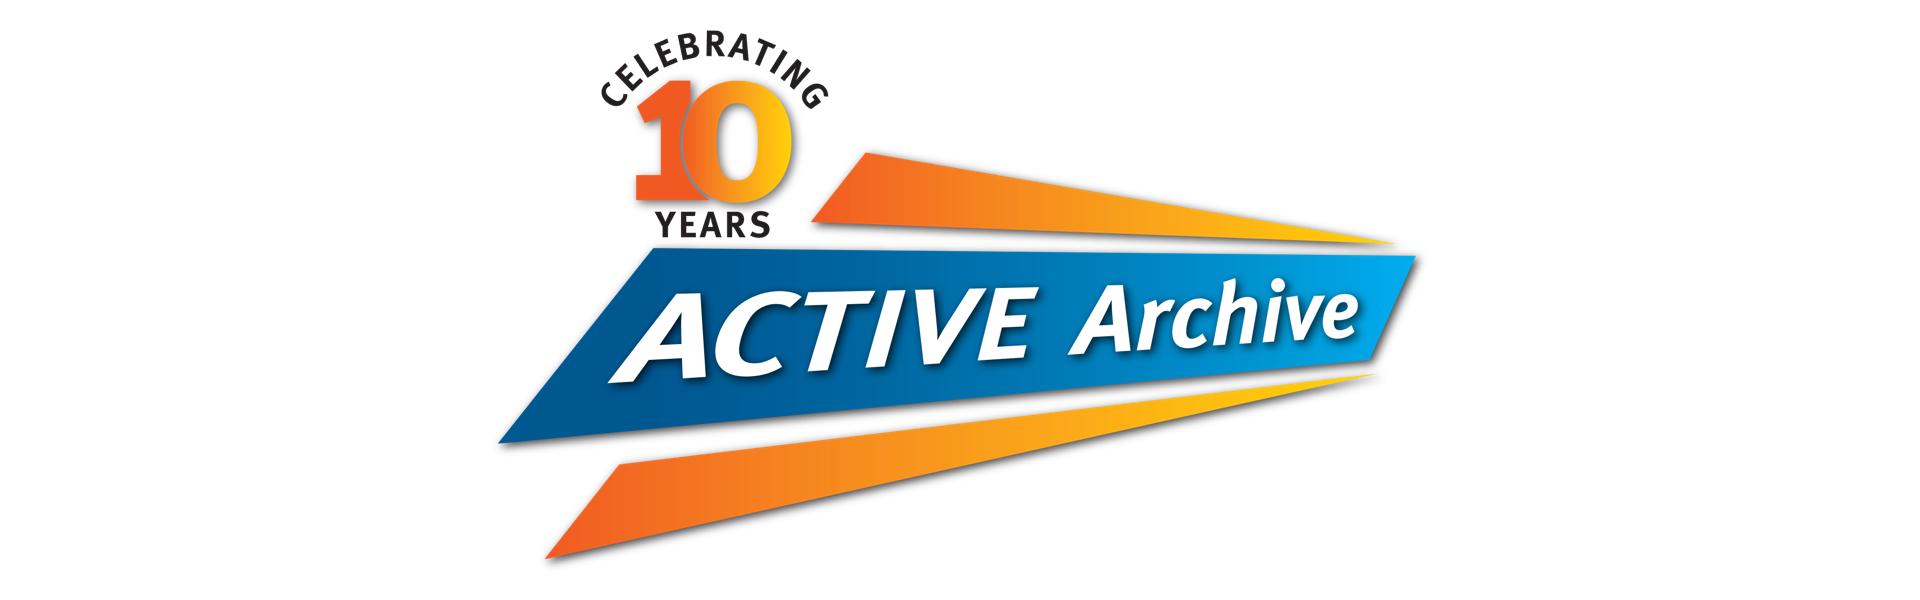 Active Archive